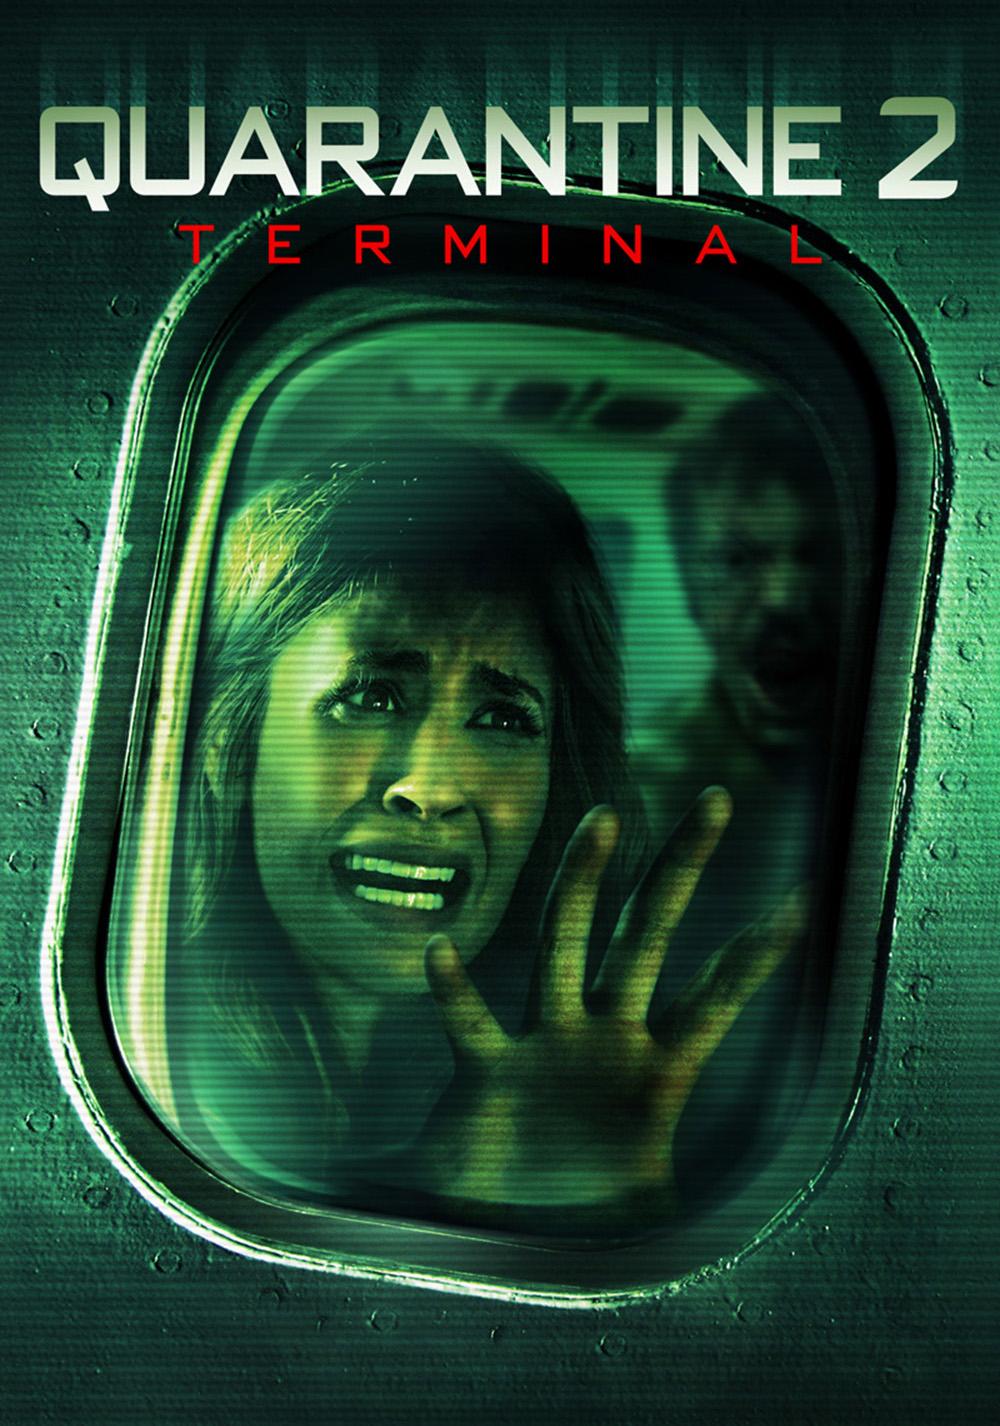 Movie Quarantine 2: Terminal